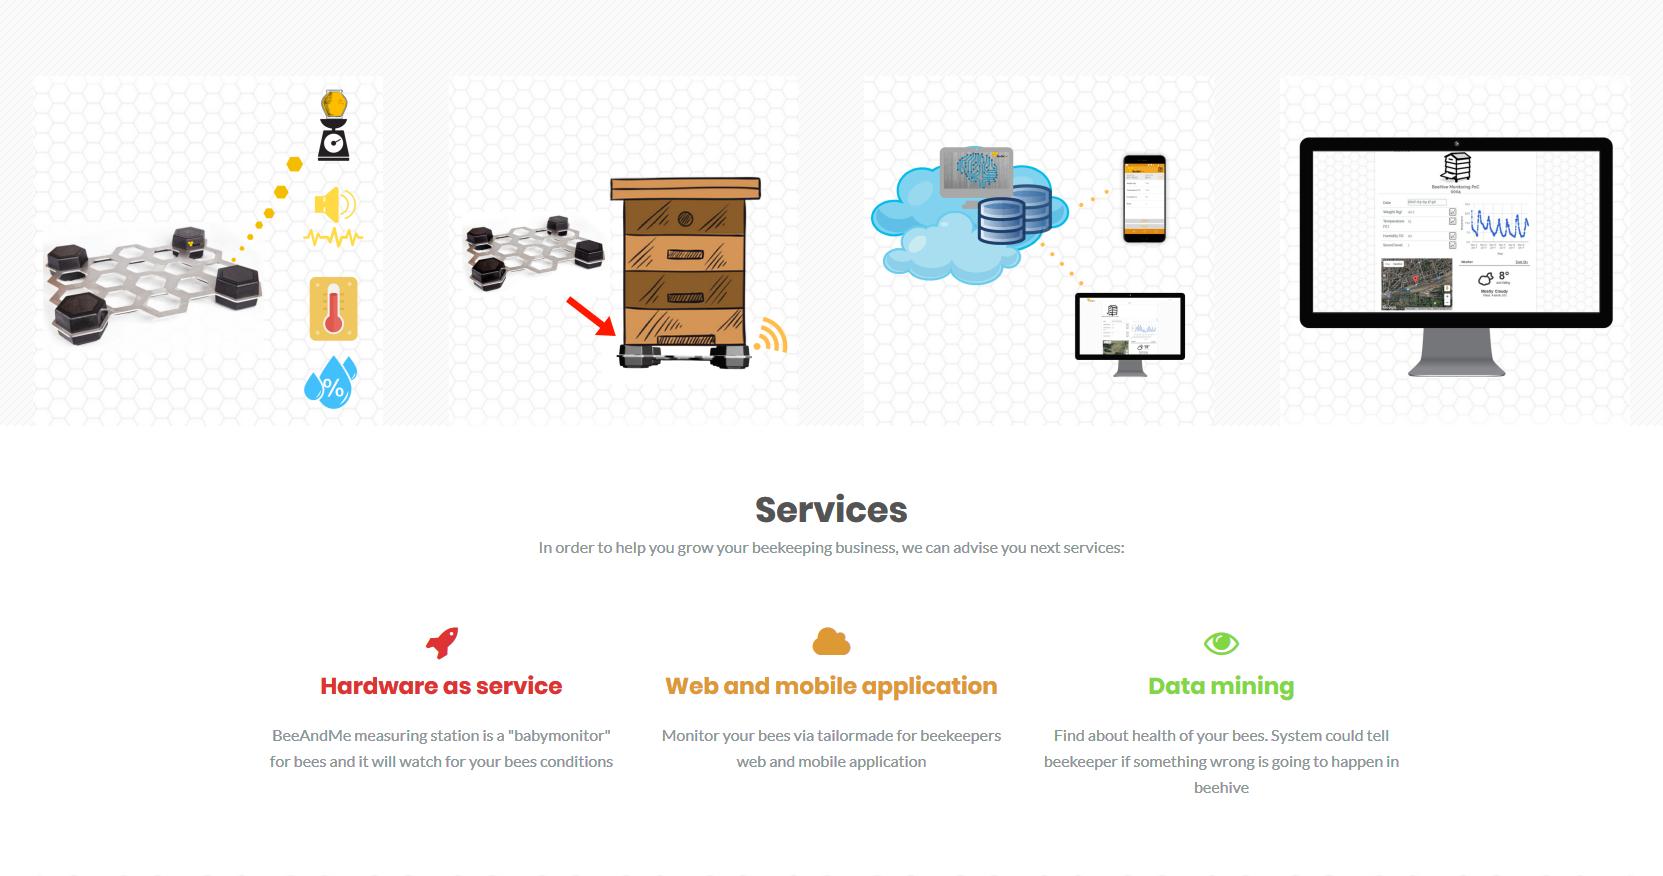 BeeAndMe - Services